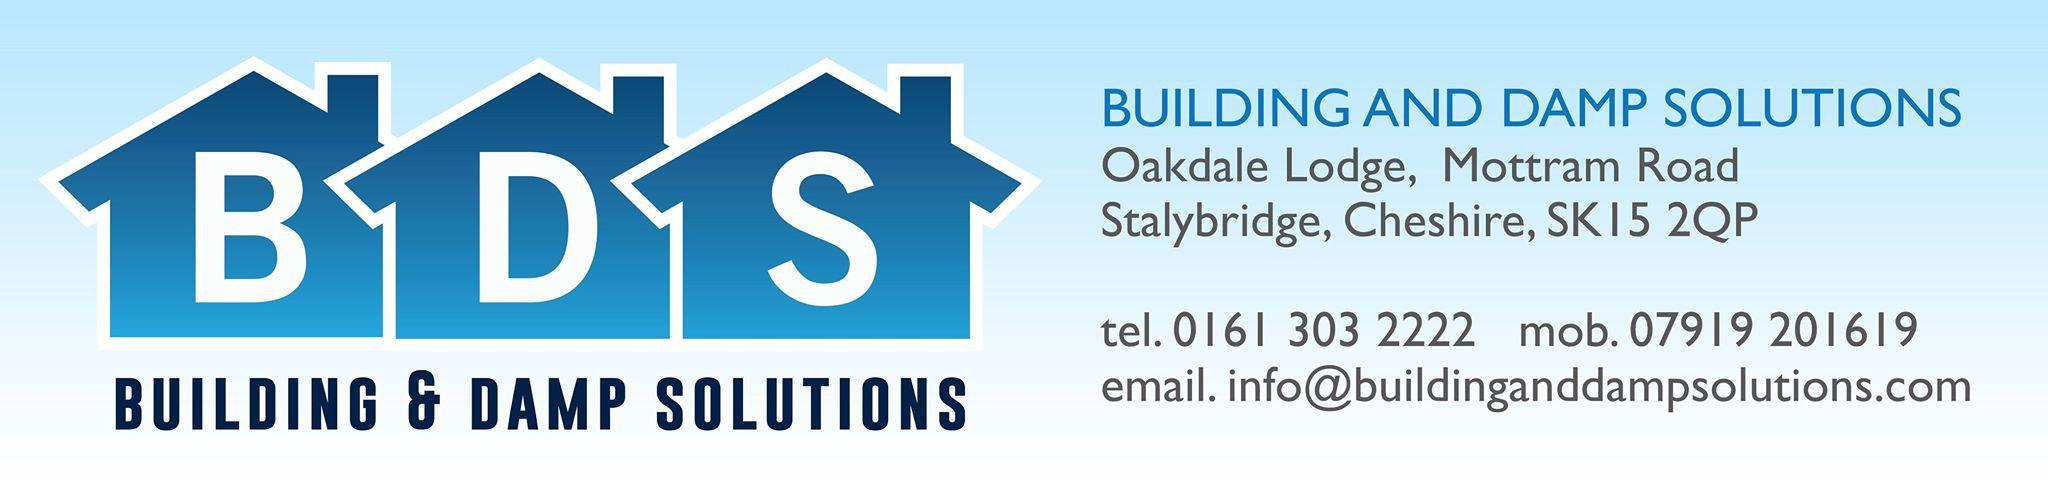 Building & Damp Solutions Ltd